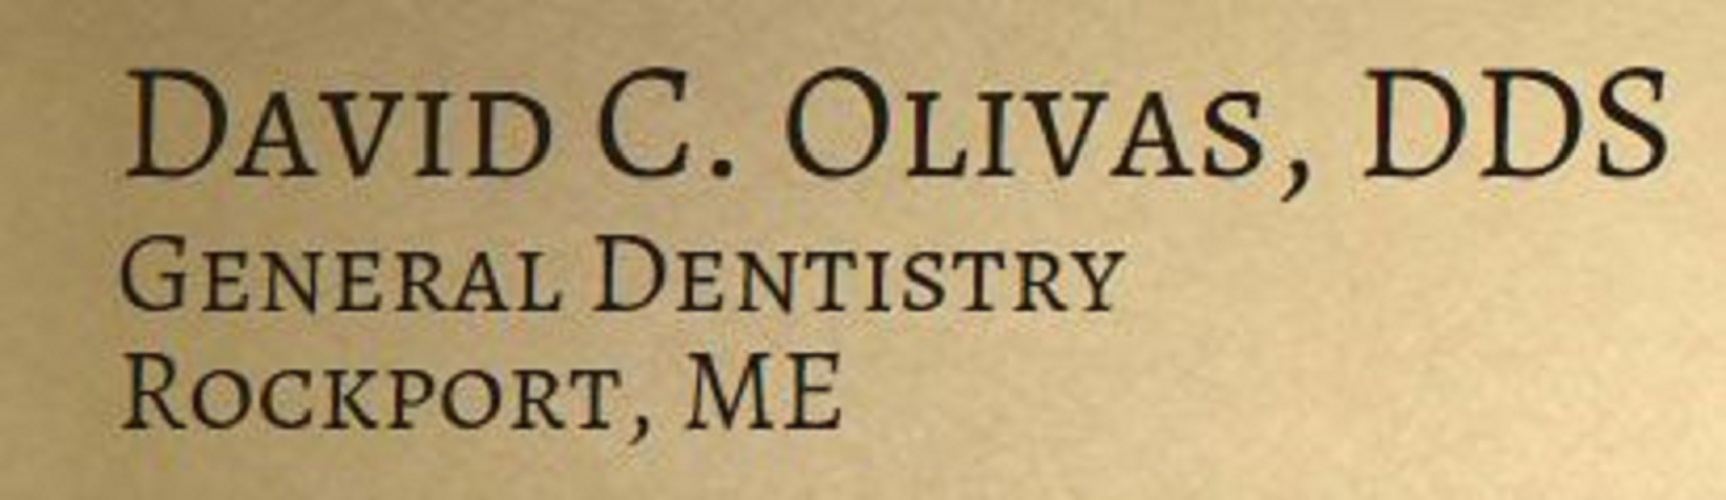 Dr. David C Olivas